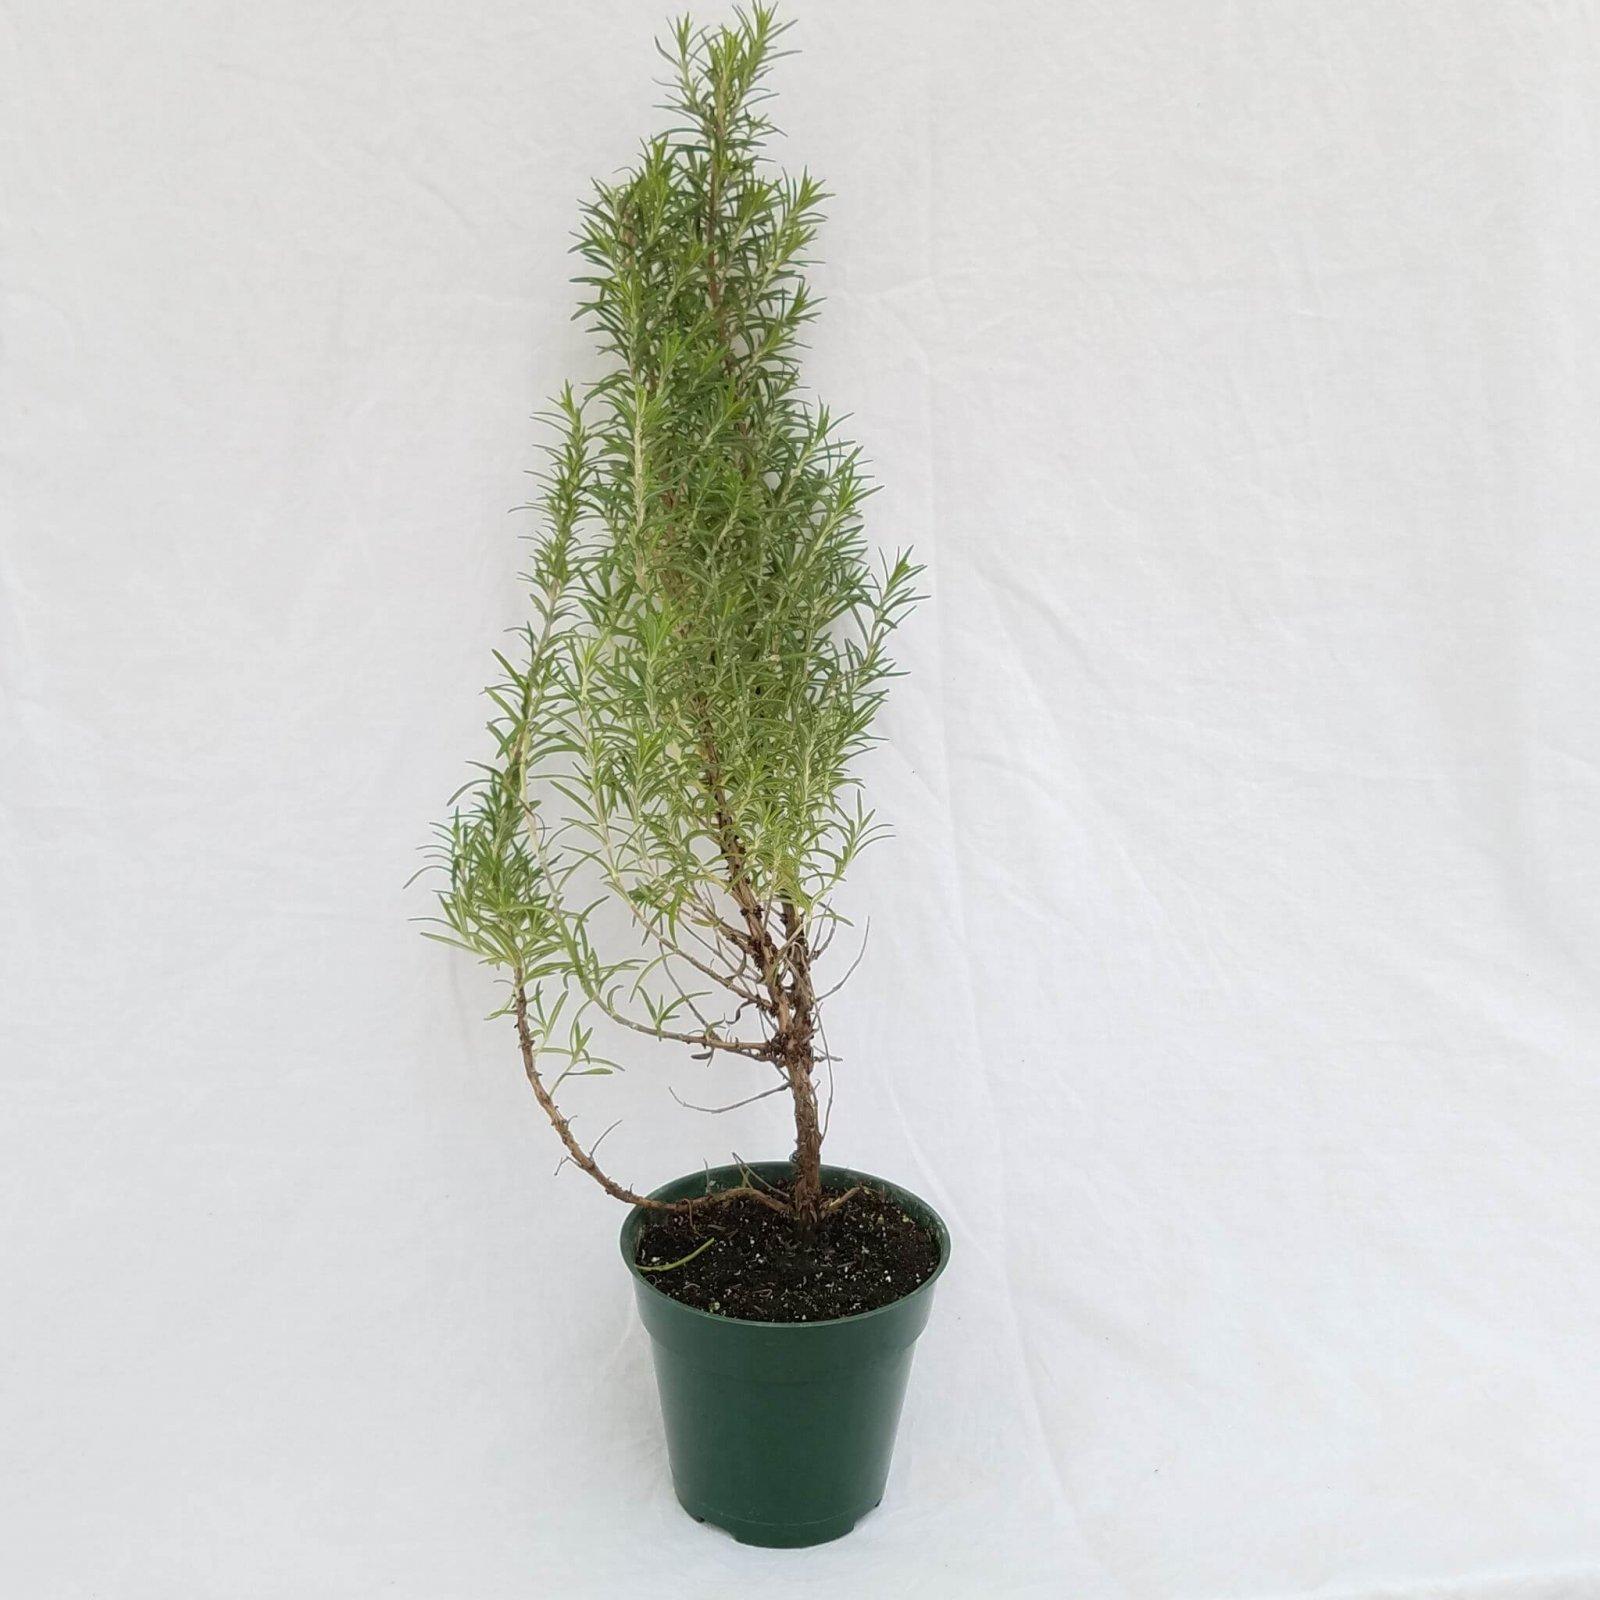 Rosemary 'Common' - 4 1/2